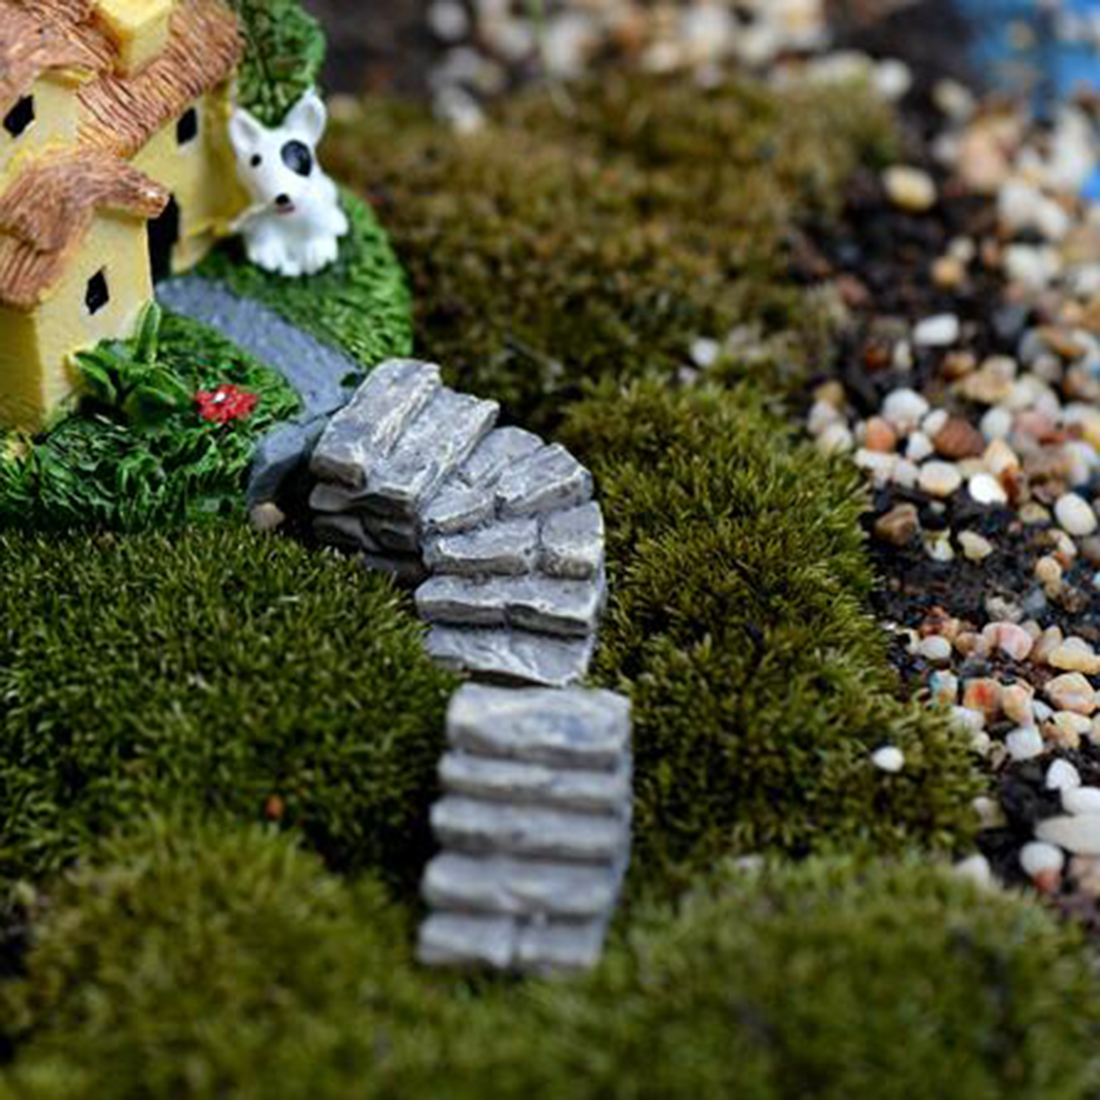 Hairy Hot Sale Stone Stairs Figures Miniature Figurine Mini Fairy Garden Microlandscape Tank Animal Statue Resin Hot Sale Mini Figurines Miniature Girl Mei Resin Crafts